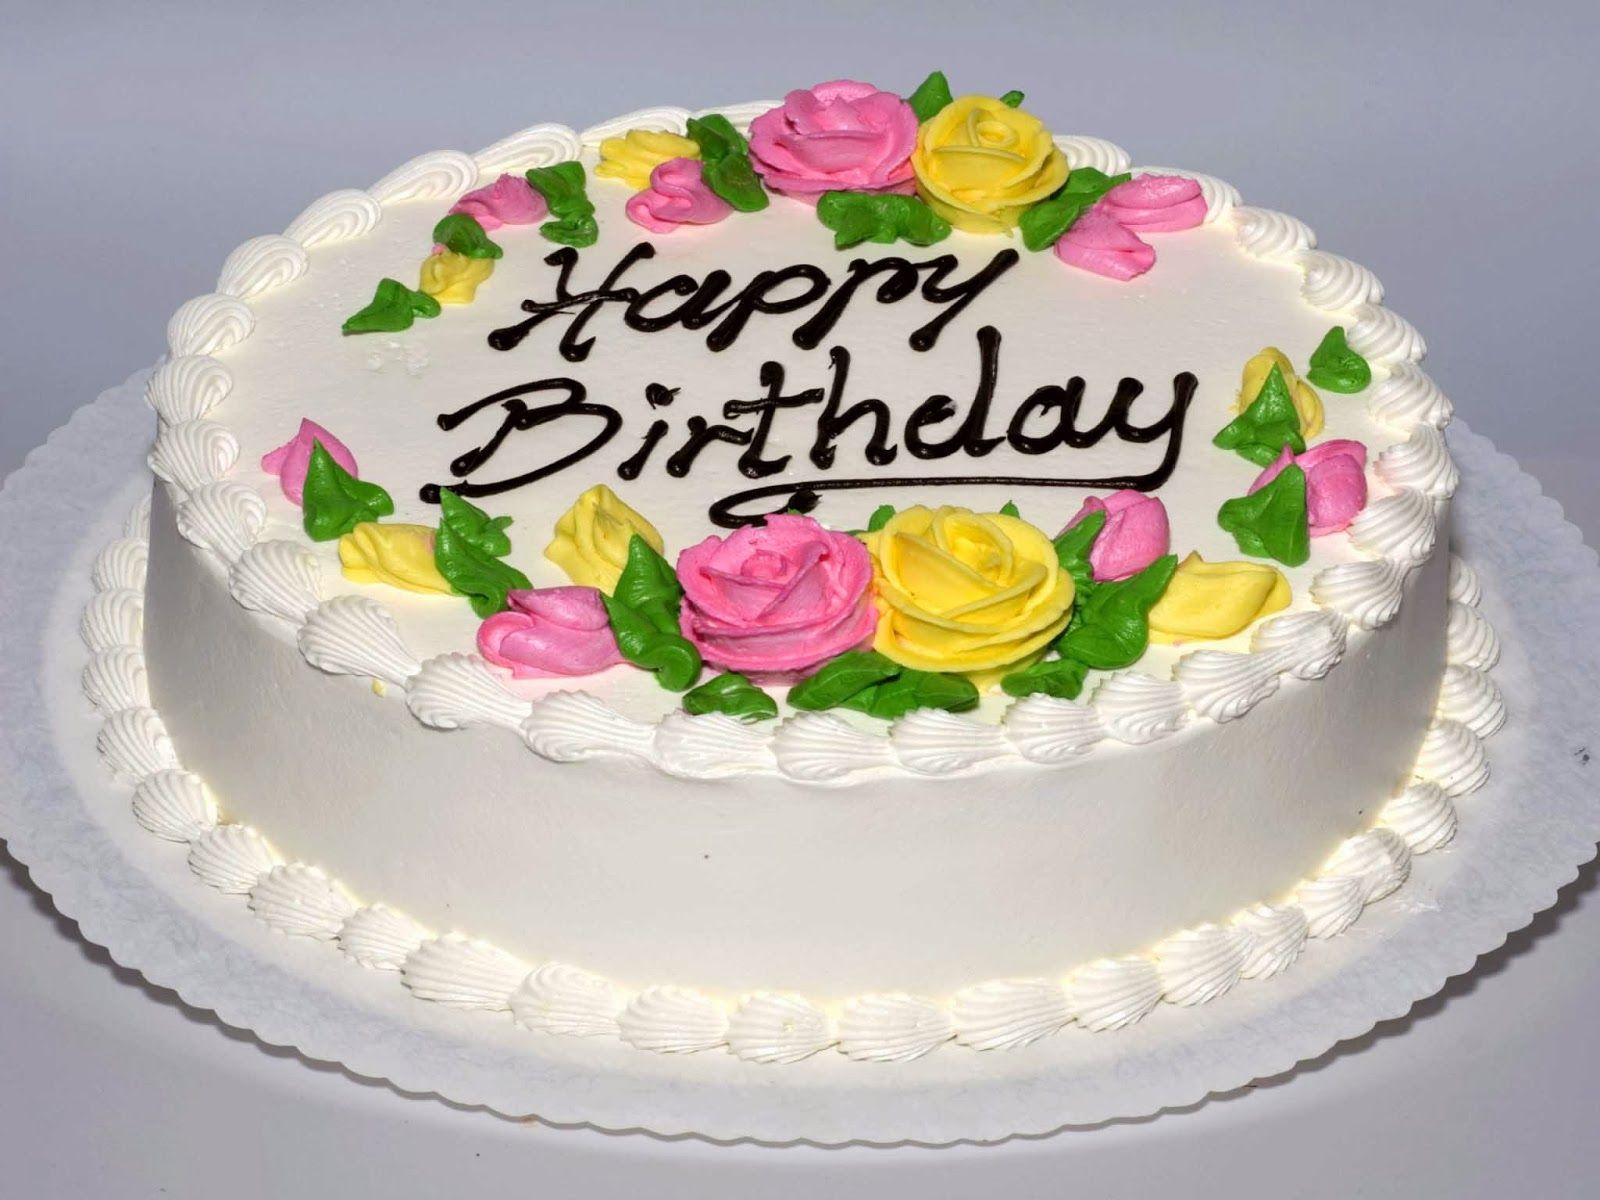 Happy Birthday Greetings free download Happy birthday